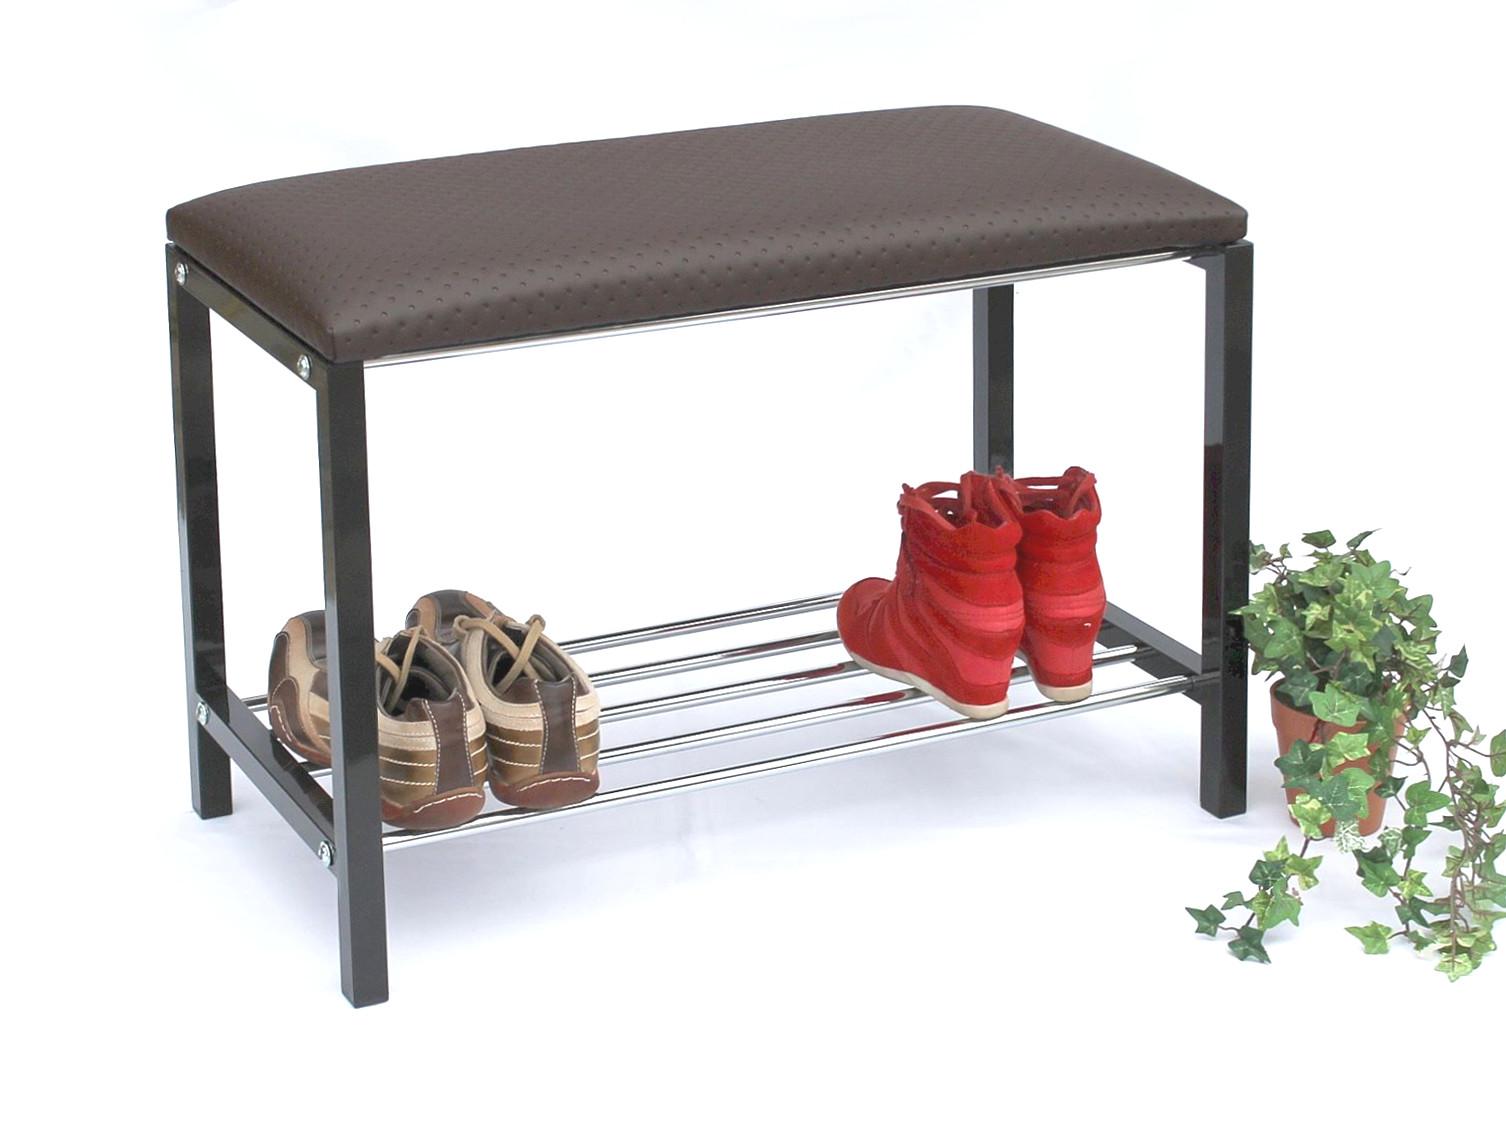 schuhregal mit sitzbank bank 70 cm schuhschrank. Black Bedroom Furniture Sets. Home Design Ideas